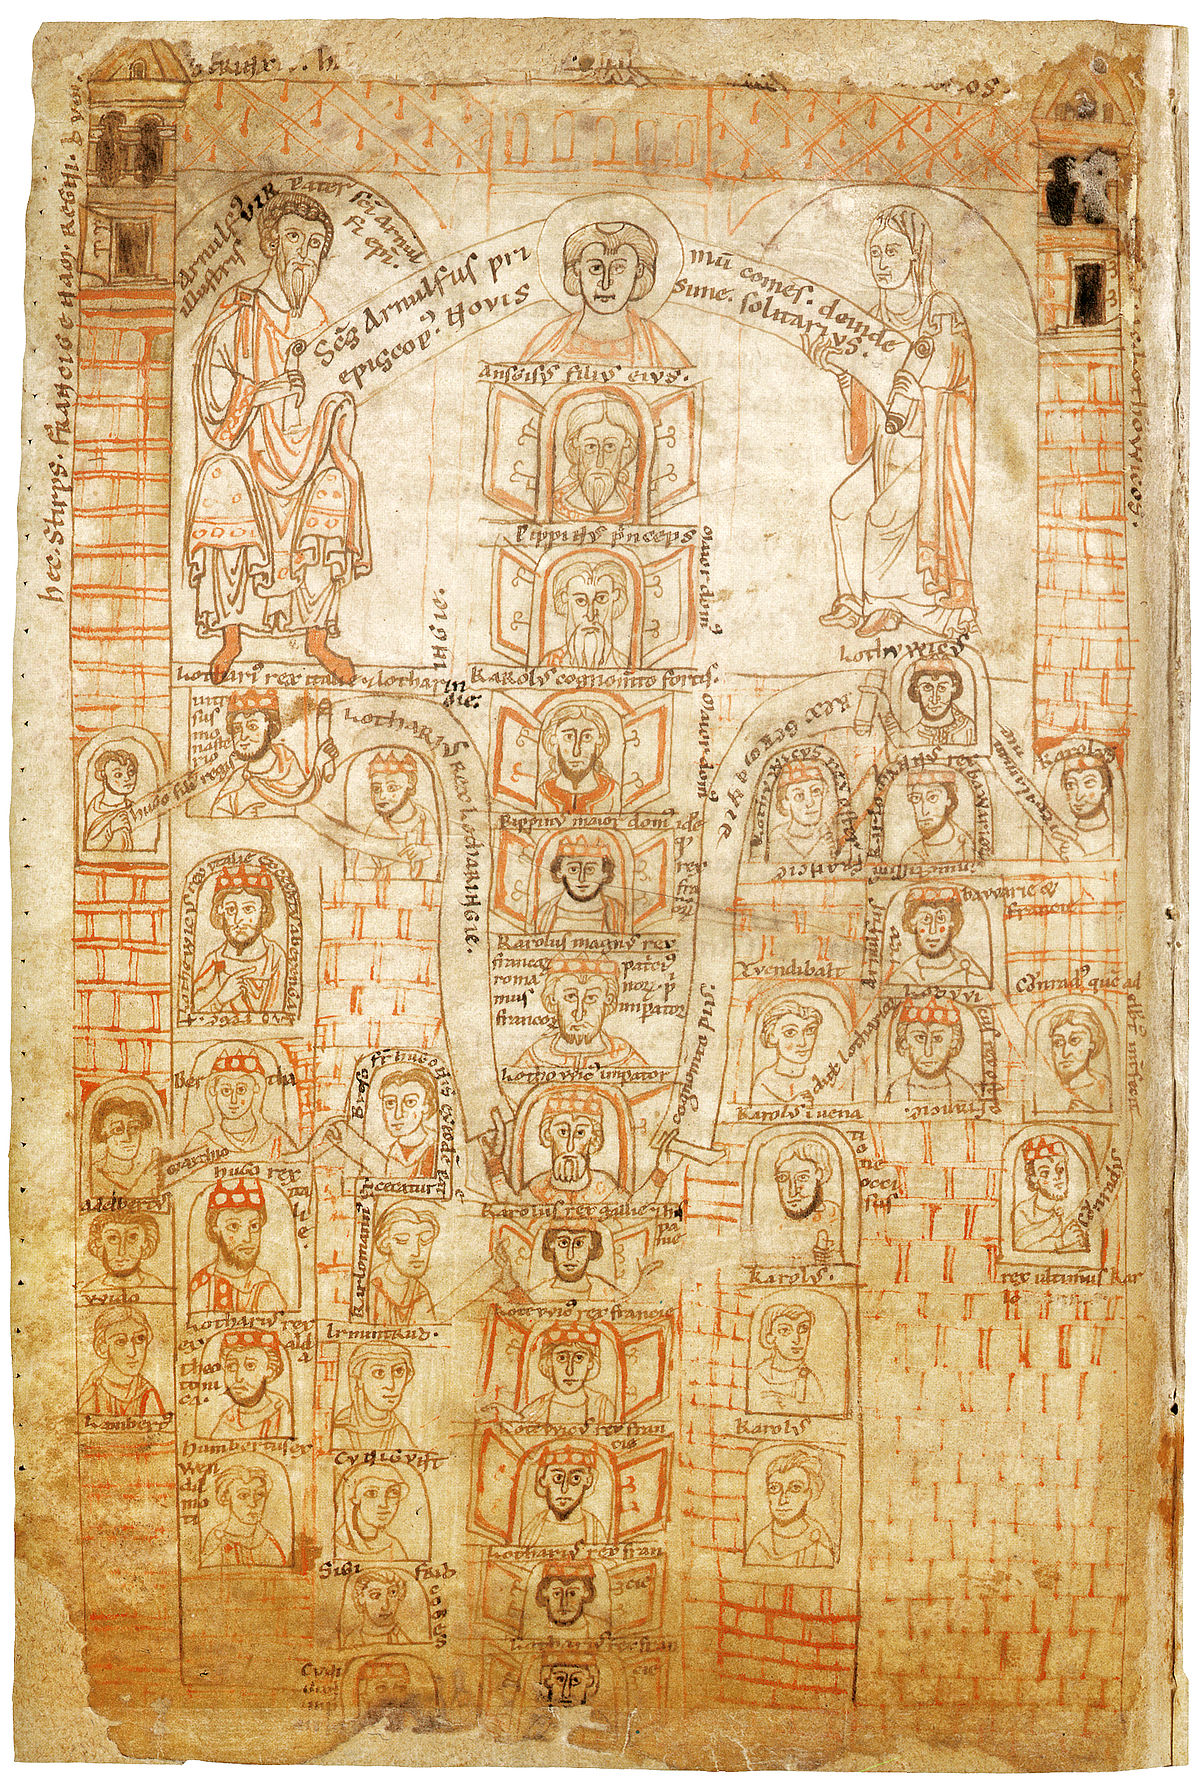 Carolingiens wikip dia - Fabriquer un arbre genealogique original ...